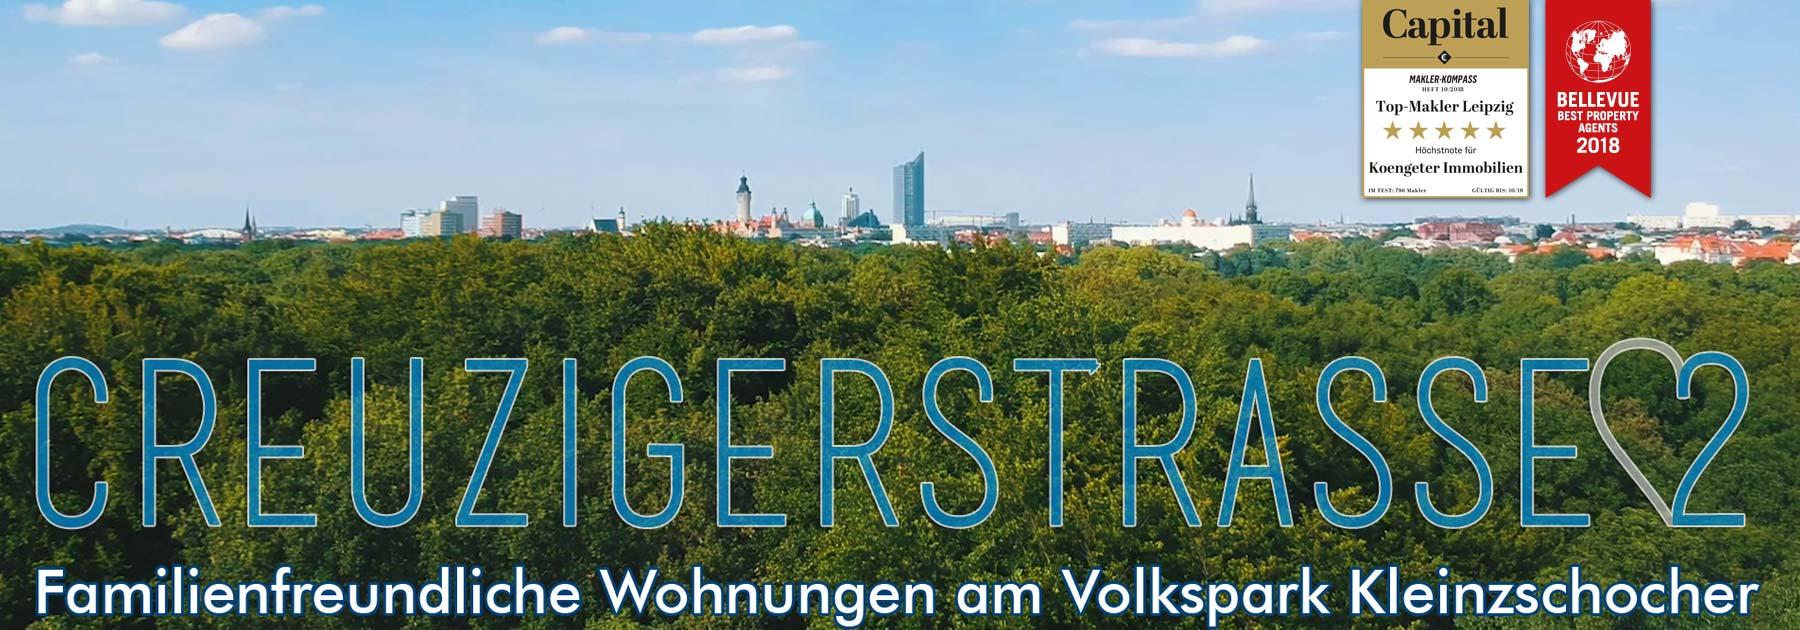 Creuziger Straße 2